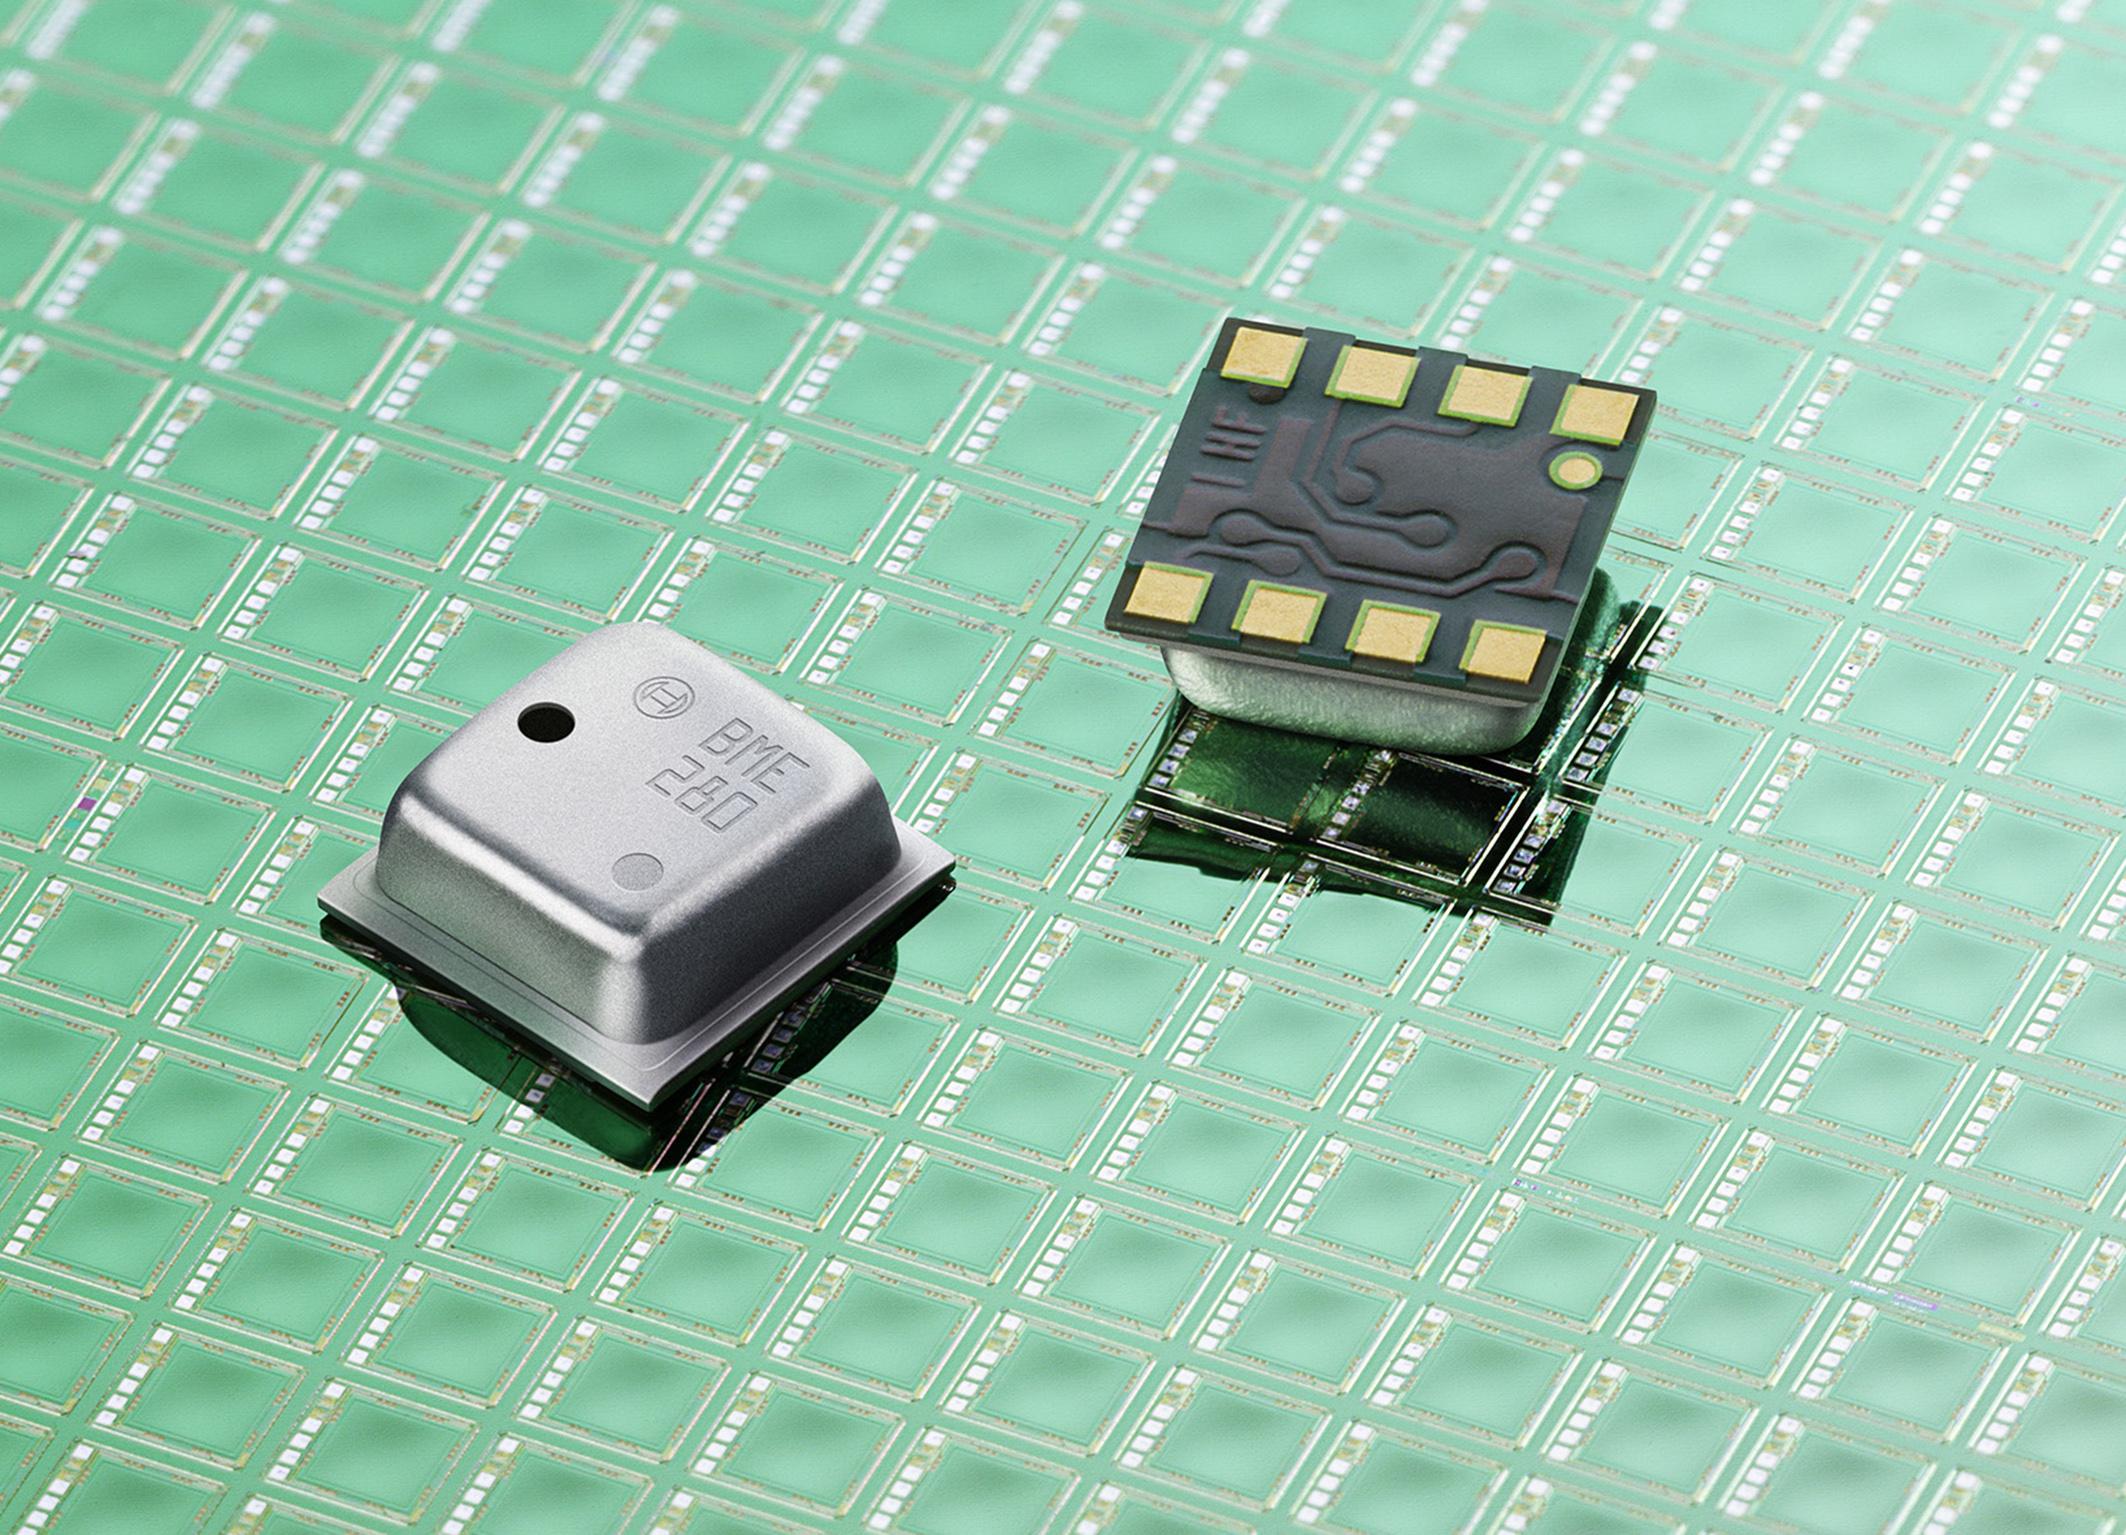 ConsumerElectronics MEMS-Sensor BME280